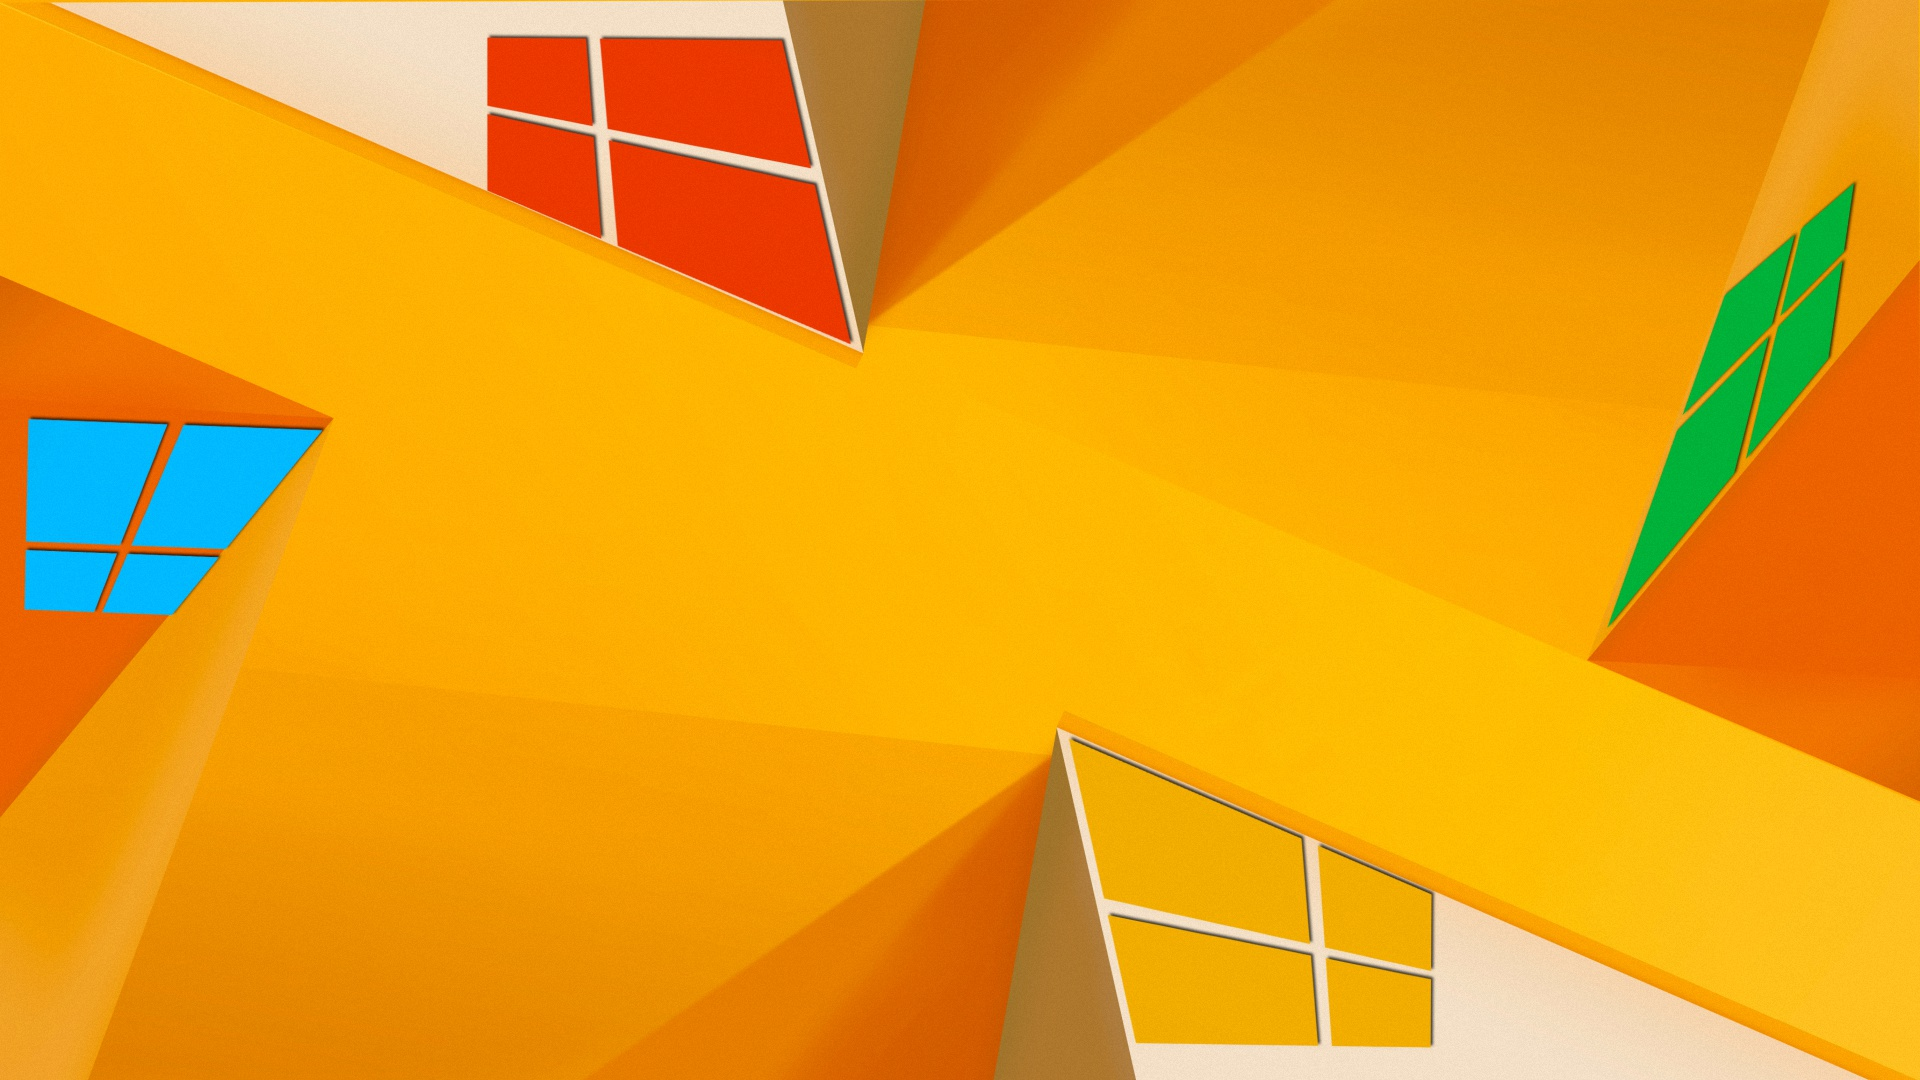 Windows 8 Official wallpaper - 1062152 - Full HD Desktop ...